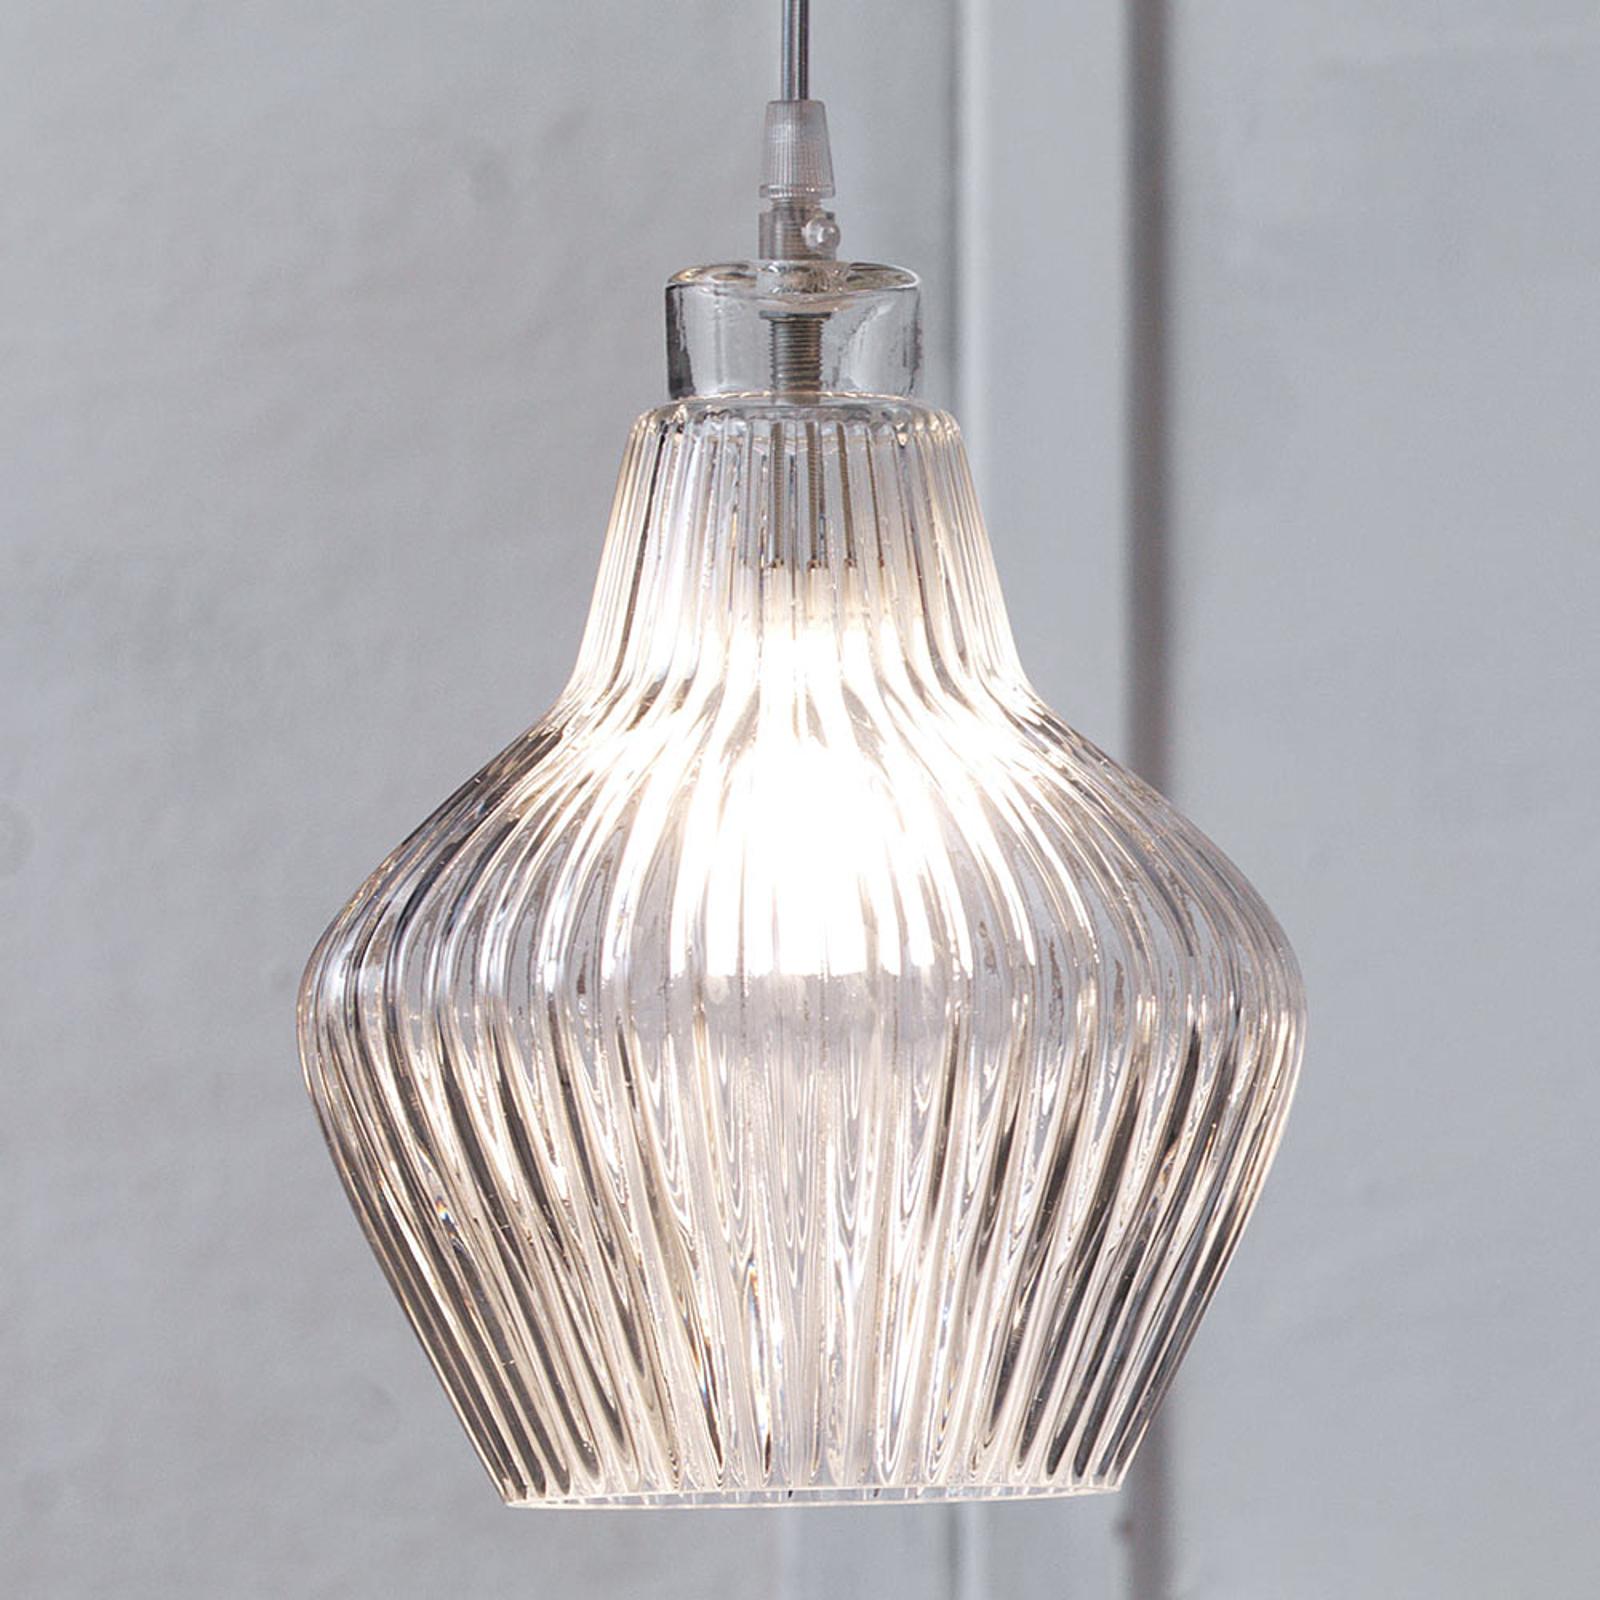 Karman Ceraunavolta szklana lampa wisząca pękata